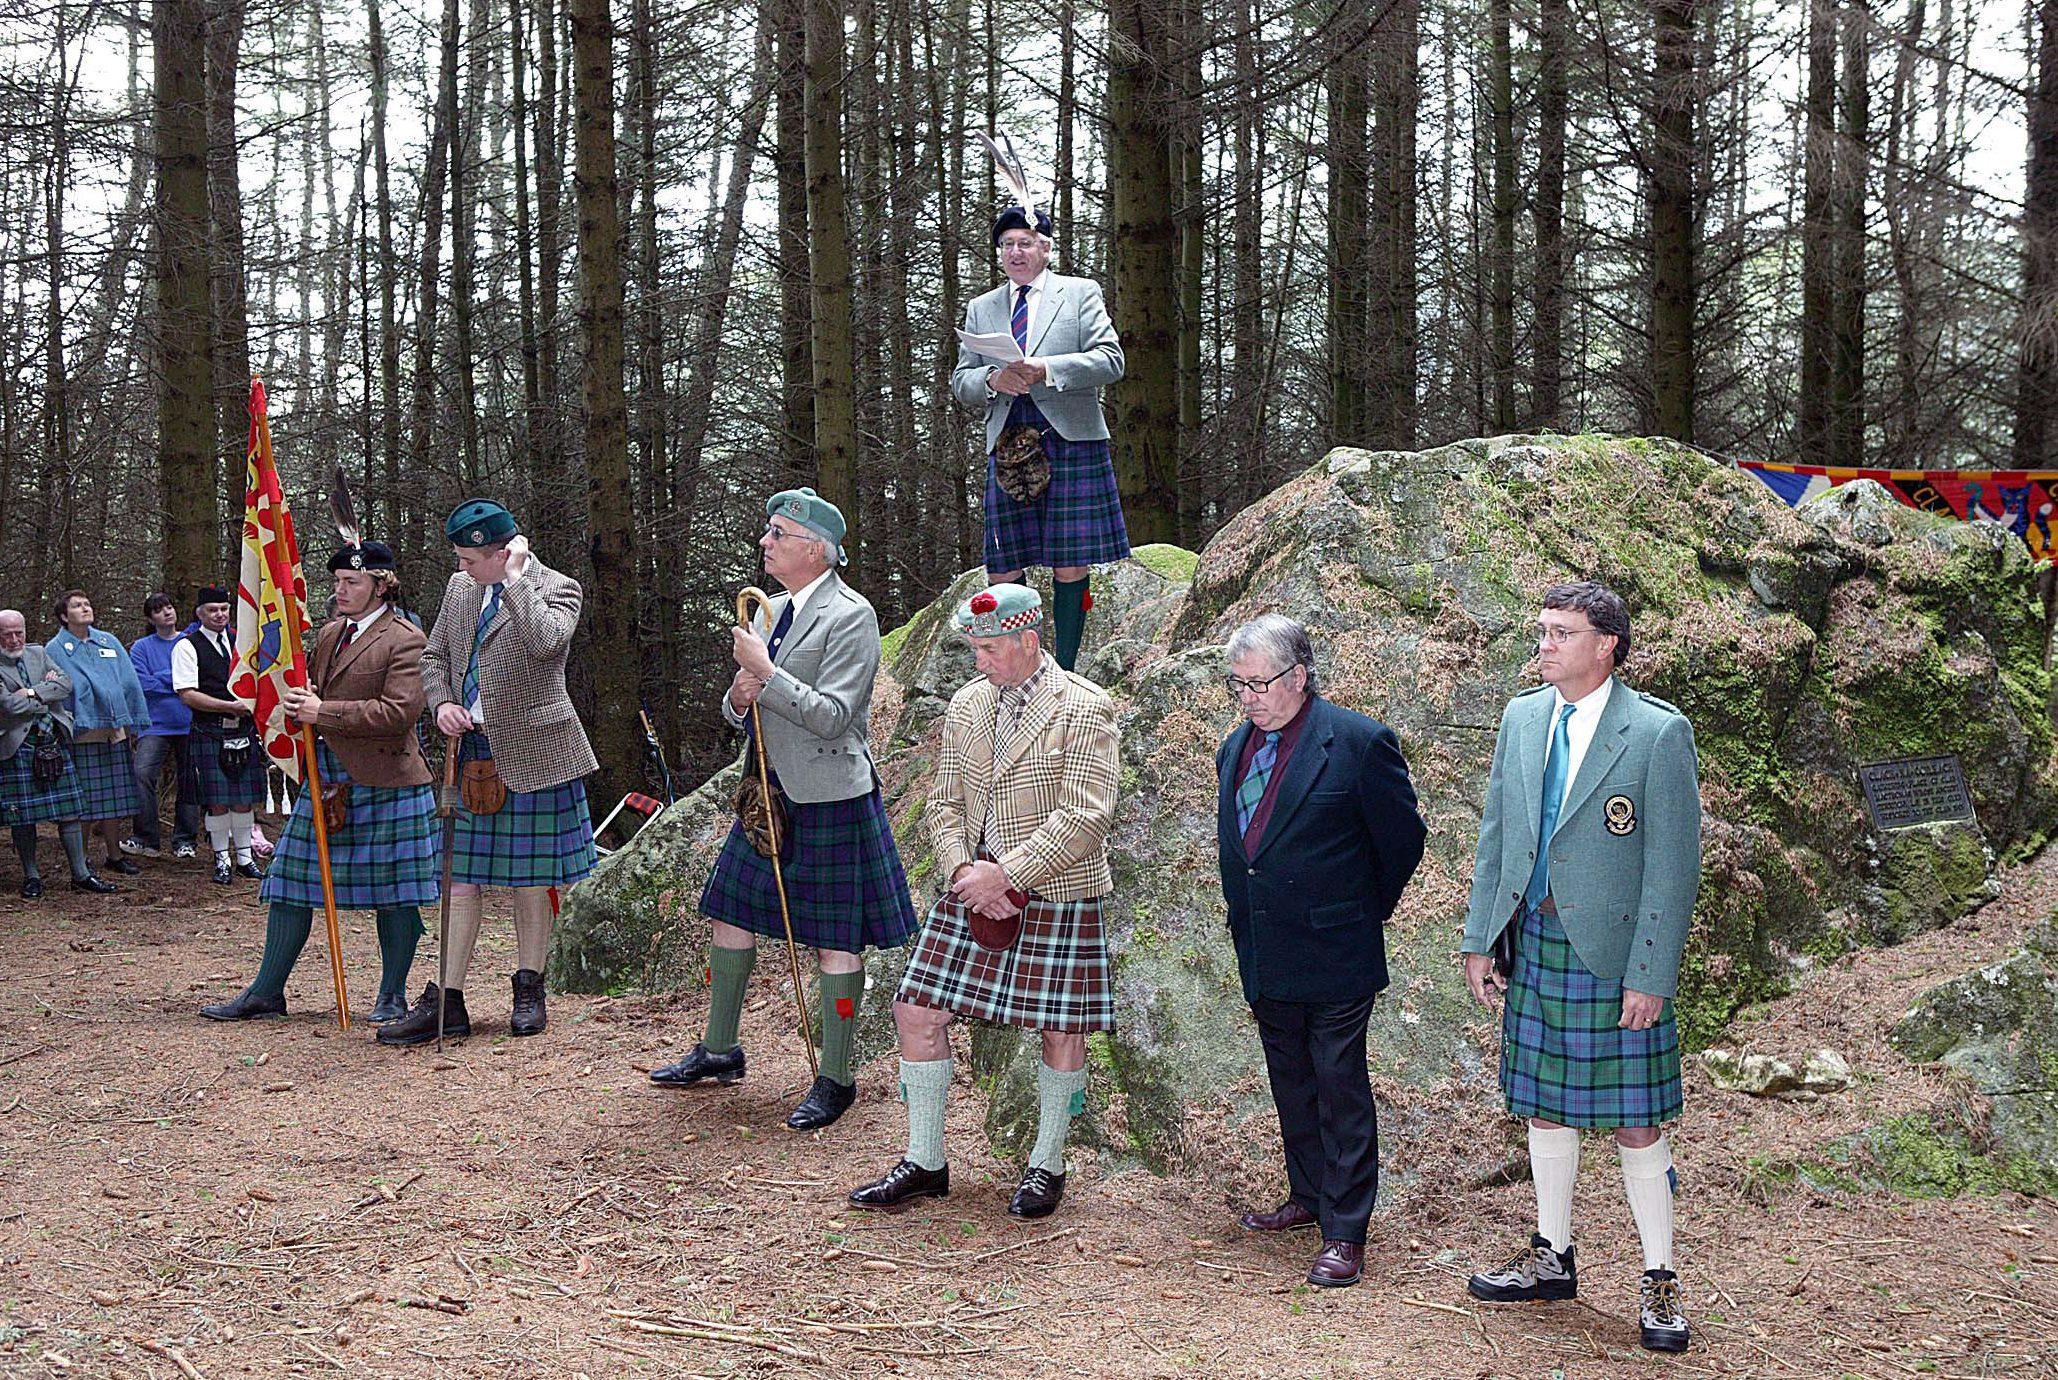 A previous Clan MacThomas gathering in Glenshee.